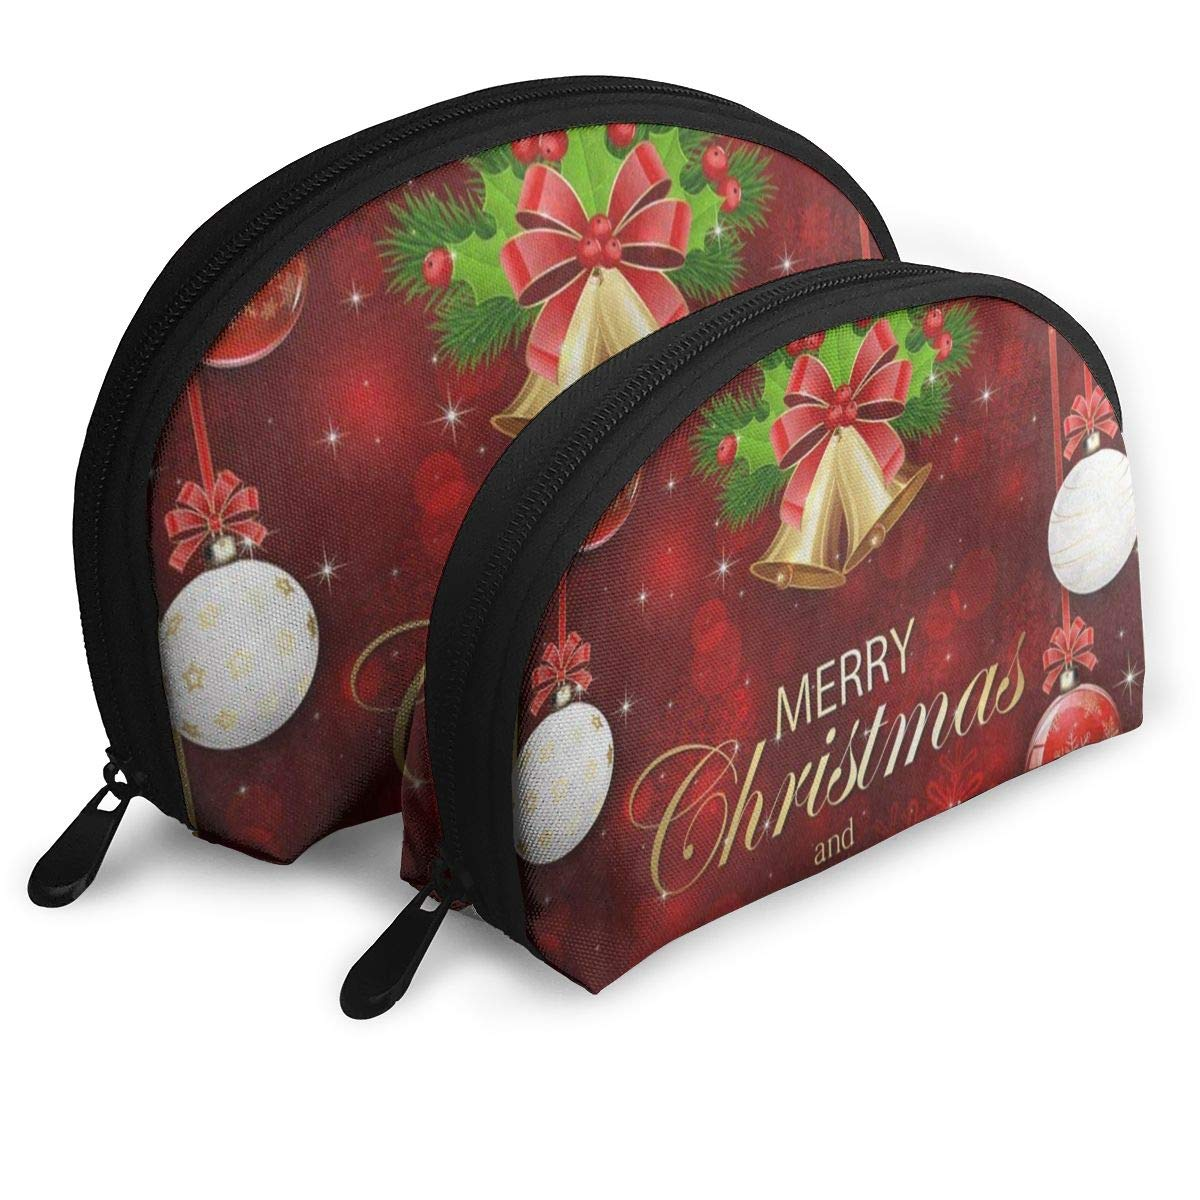 6828983879e6 Amazon.com : Makeup Bag Red Sparkle Snowflake Merry Christmas ...